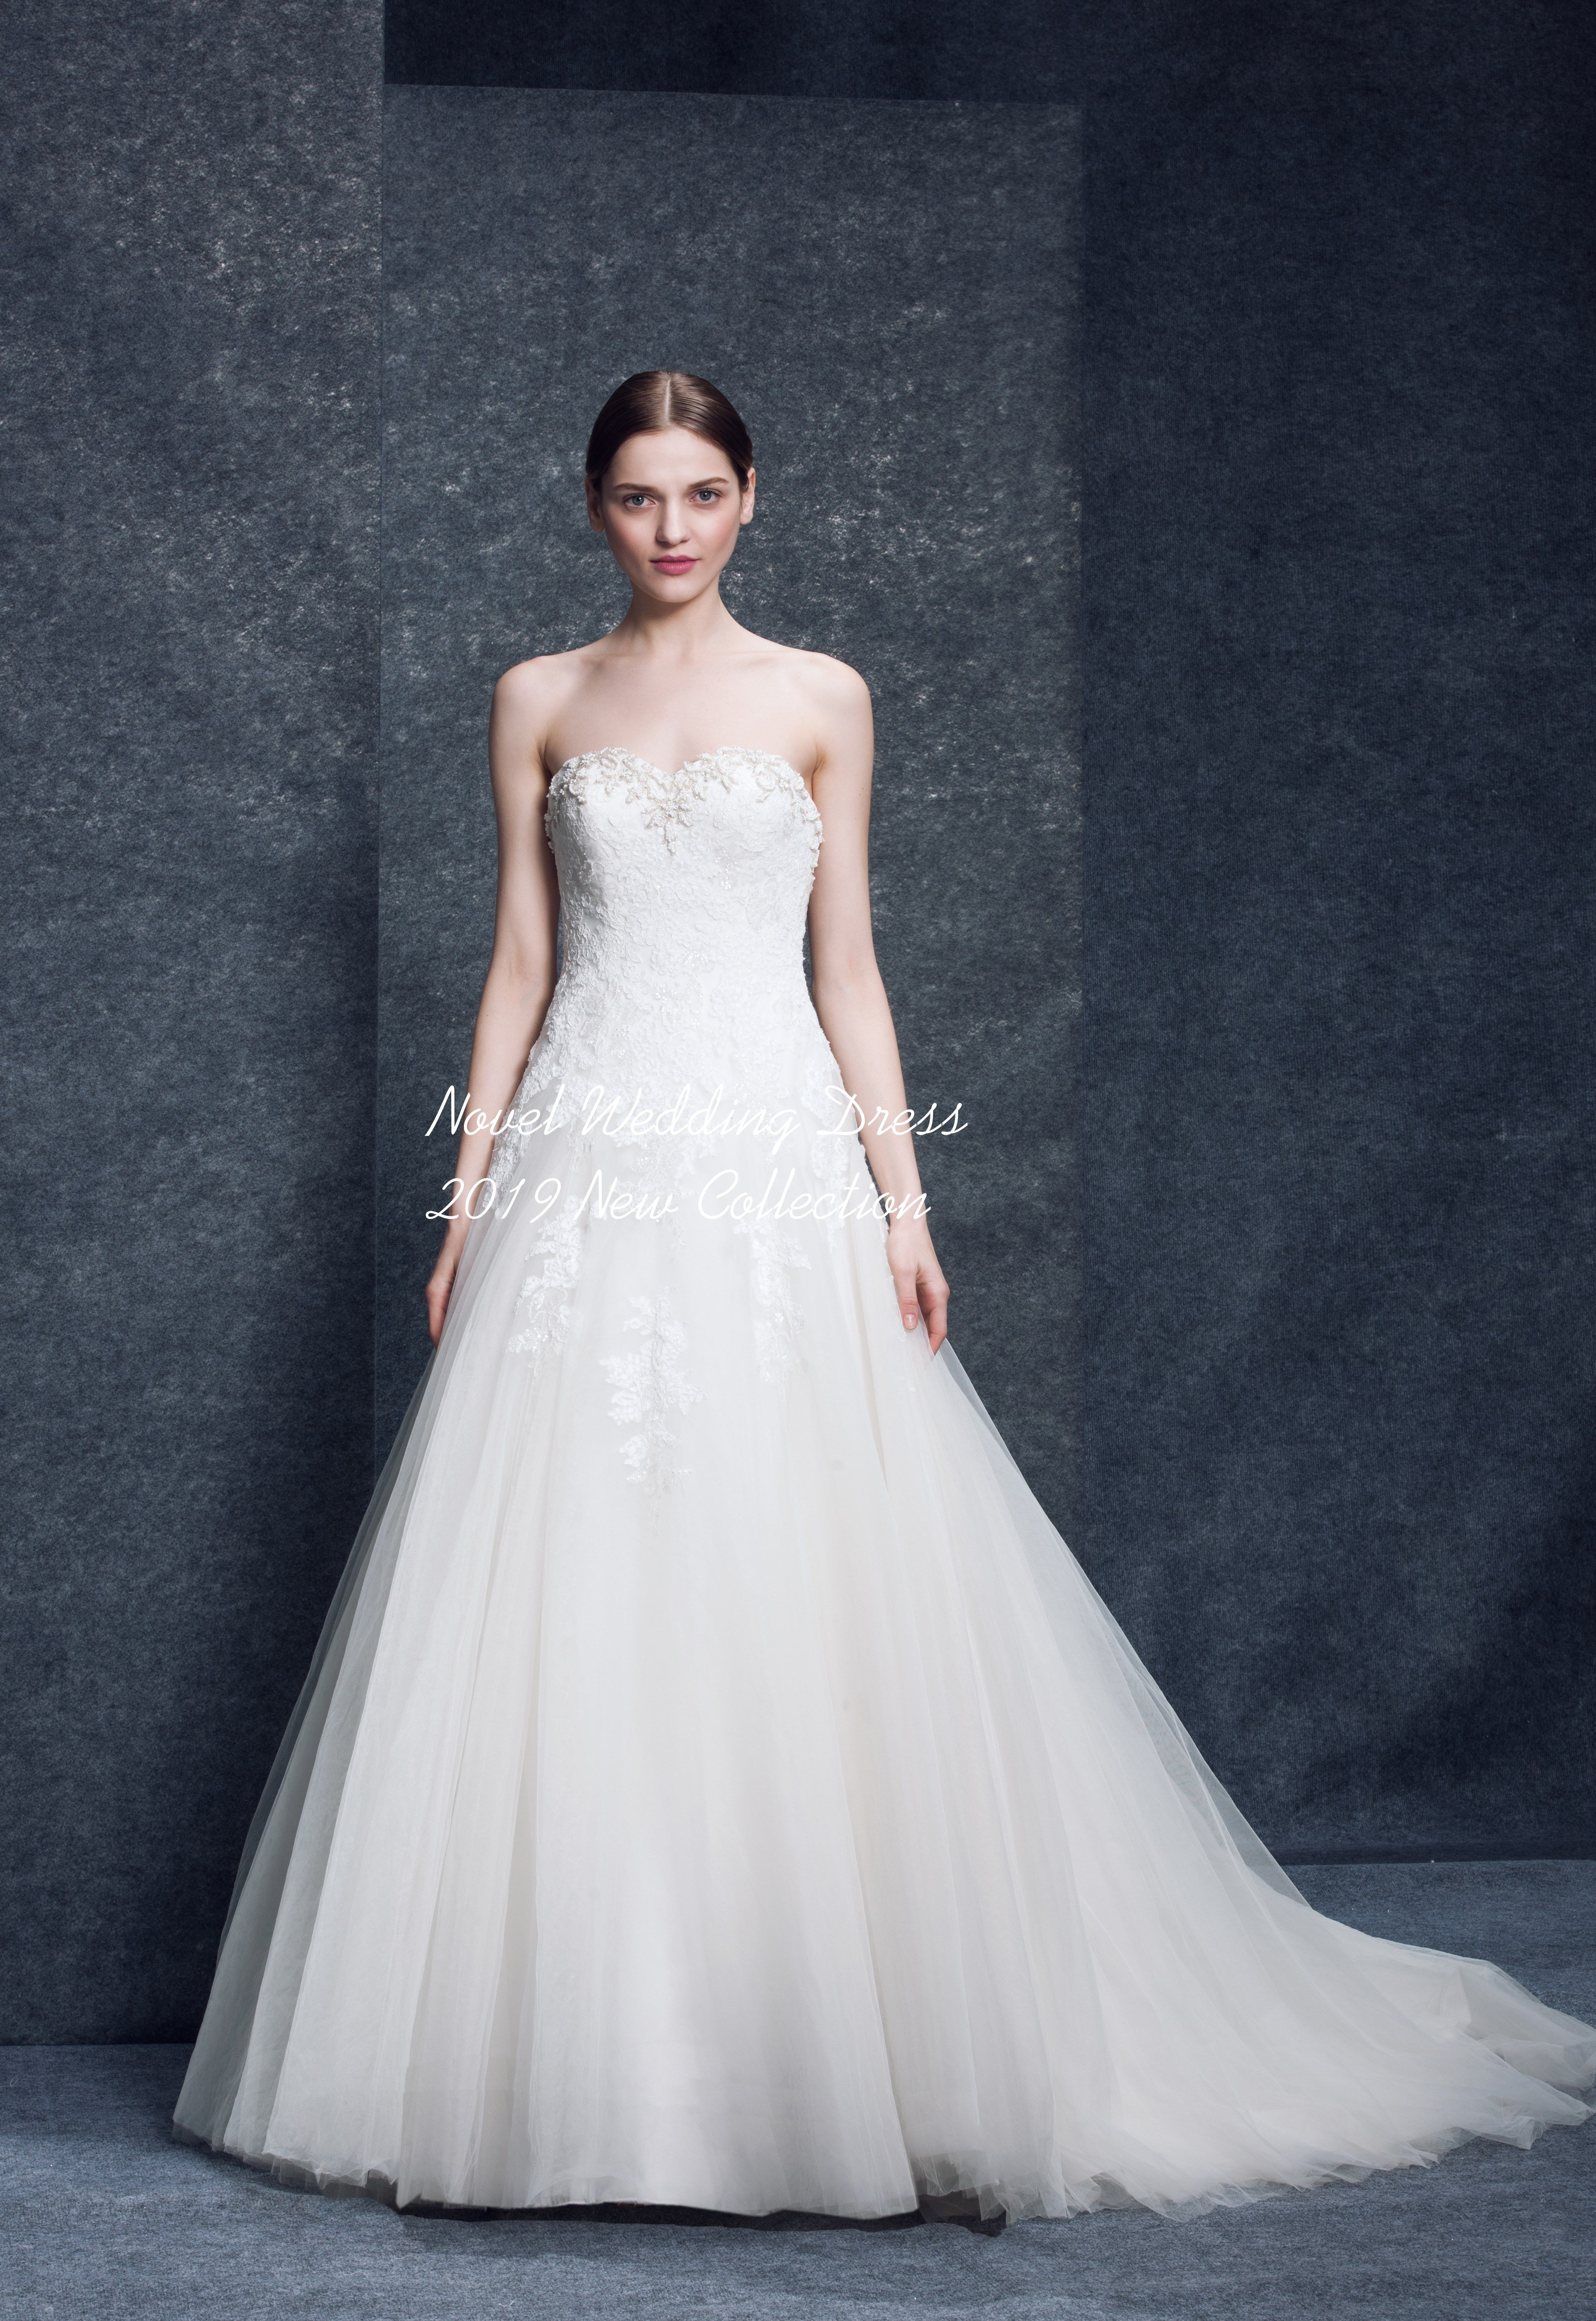 Wedding dresses champagne color wedding dresses detachable train